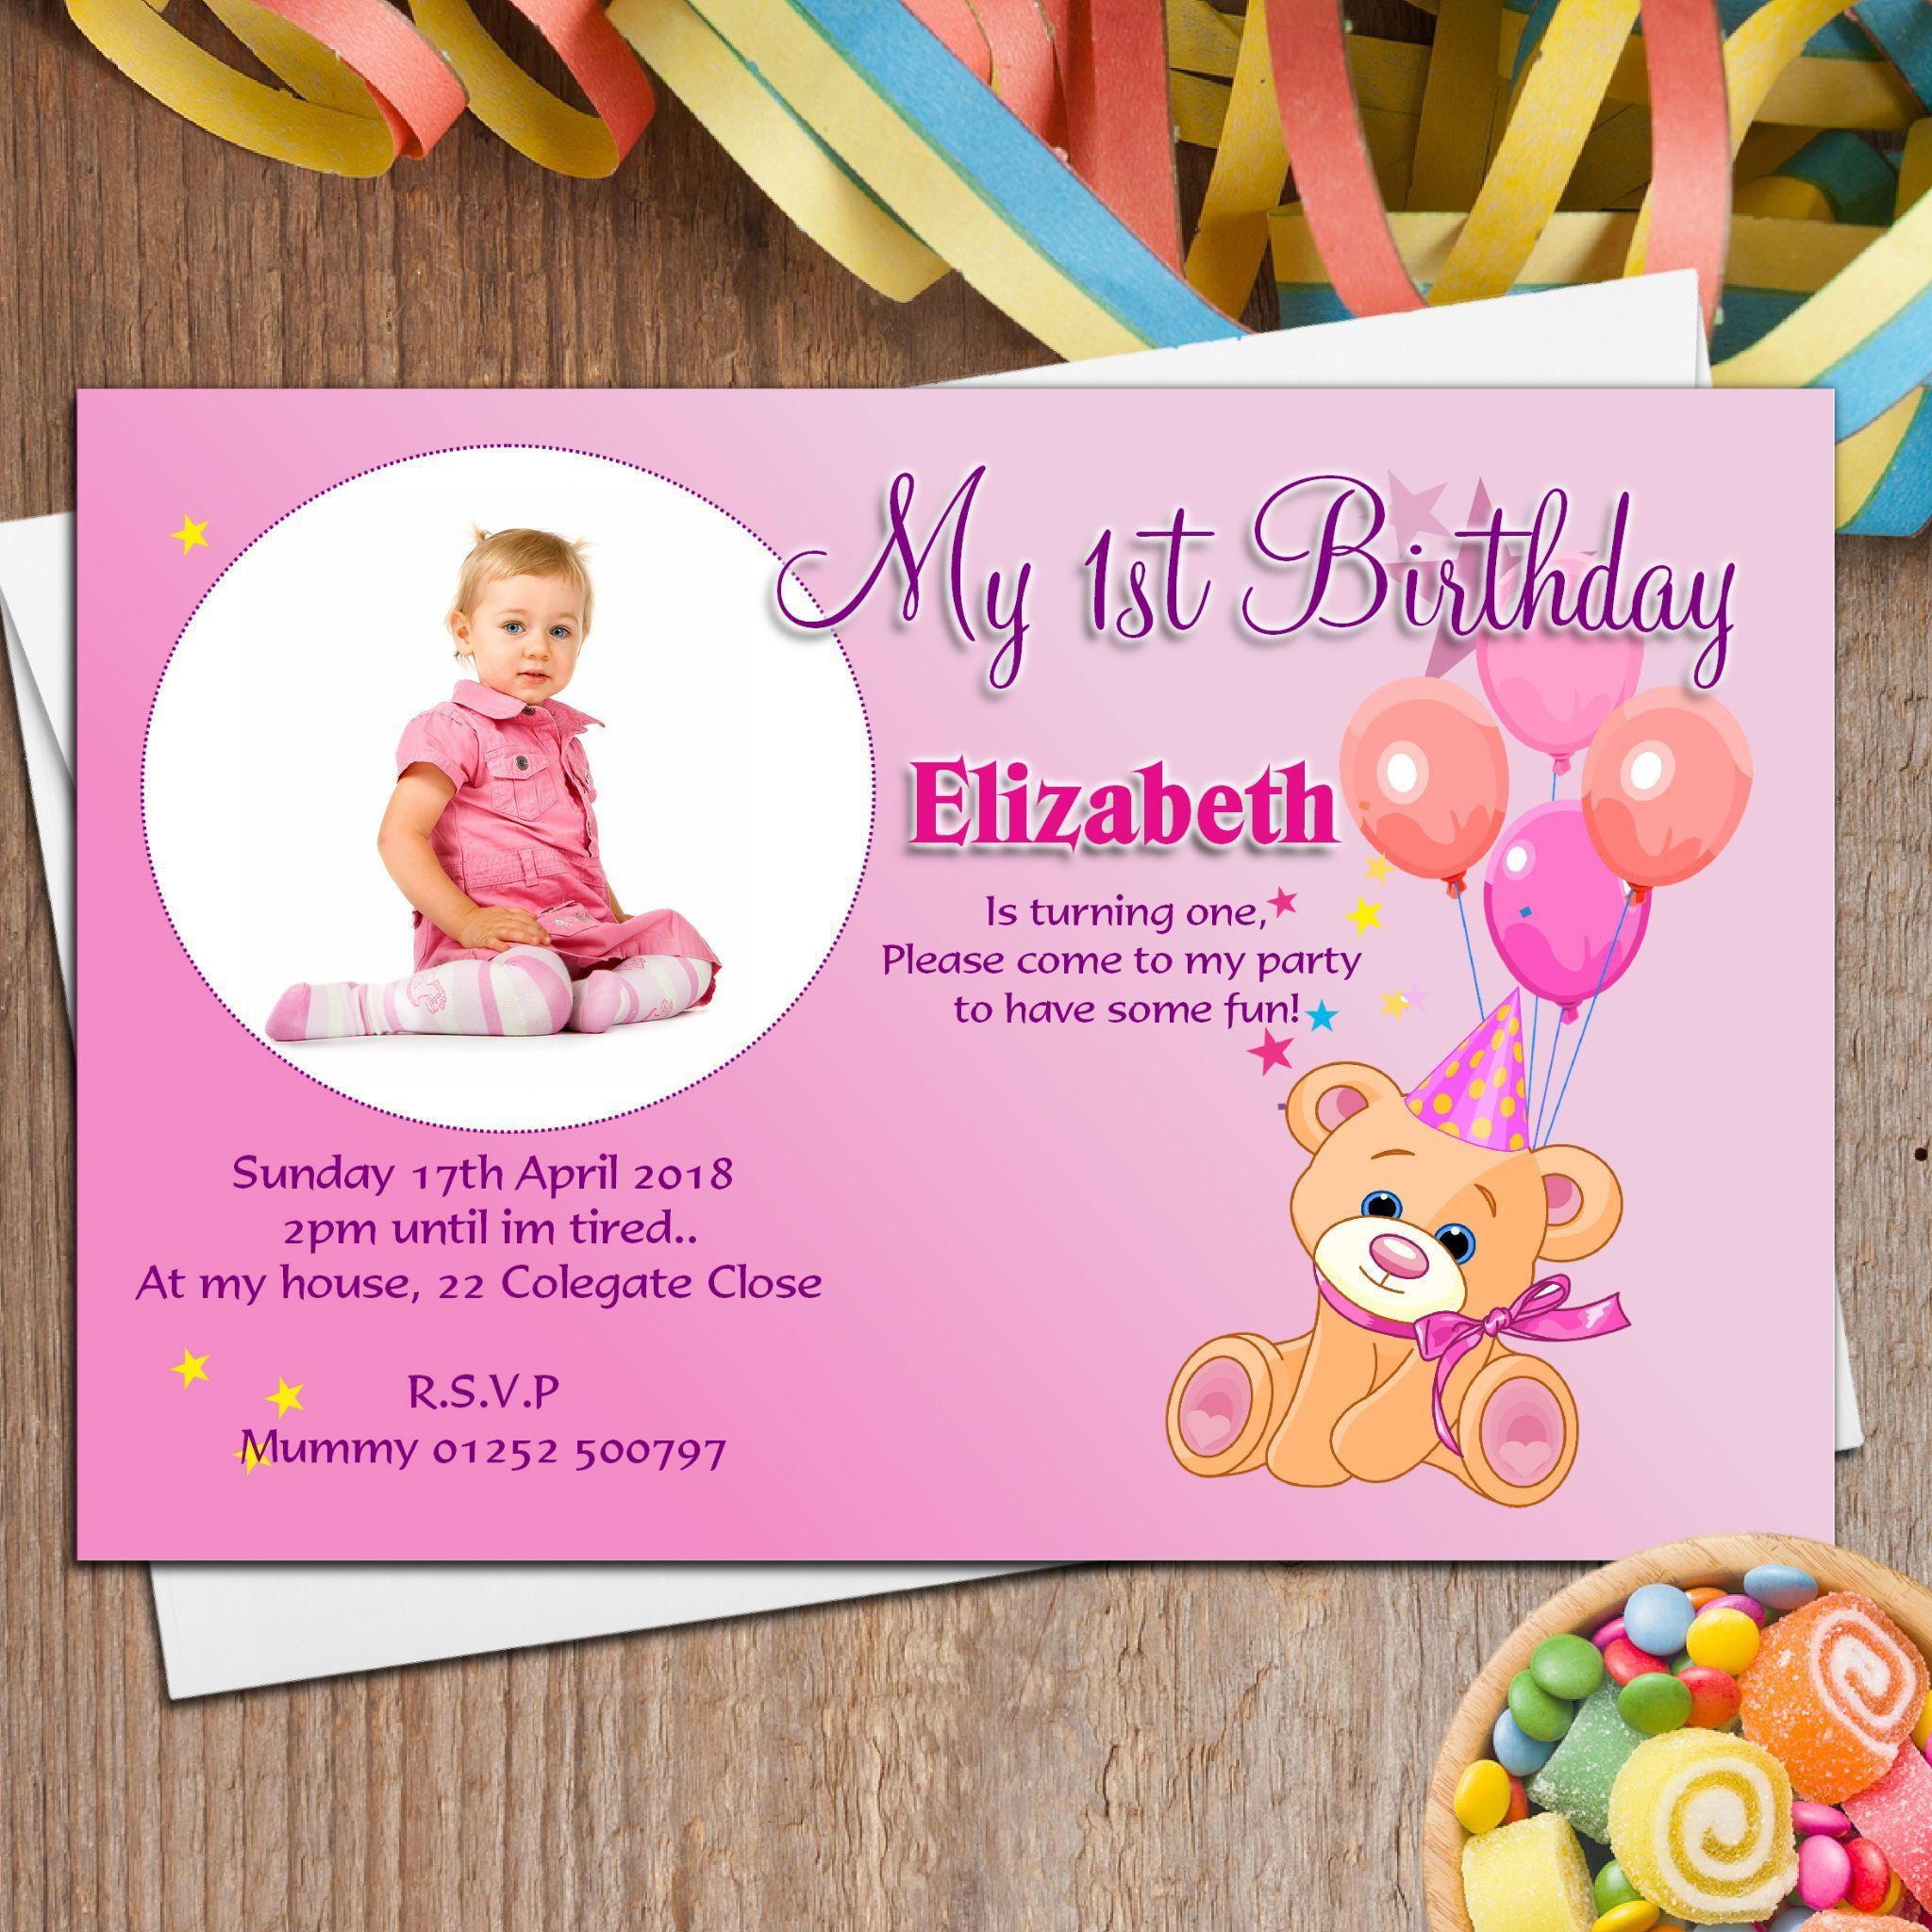 Birthday Invitation Template : Birthday Card Invitations Templates